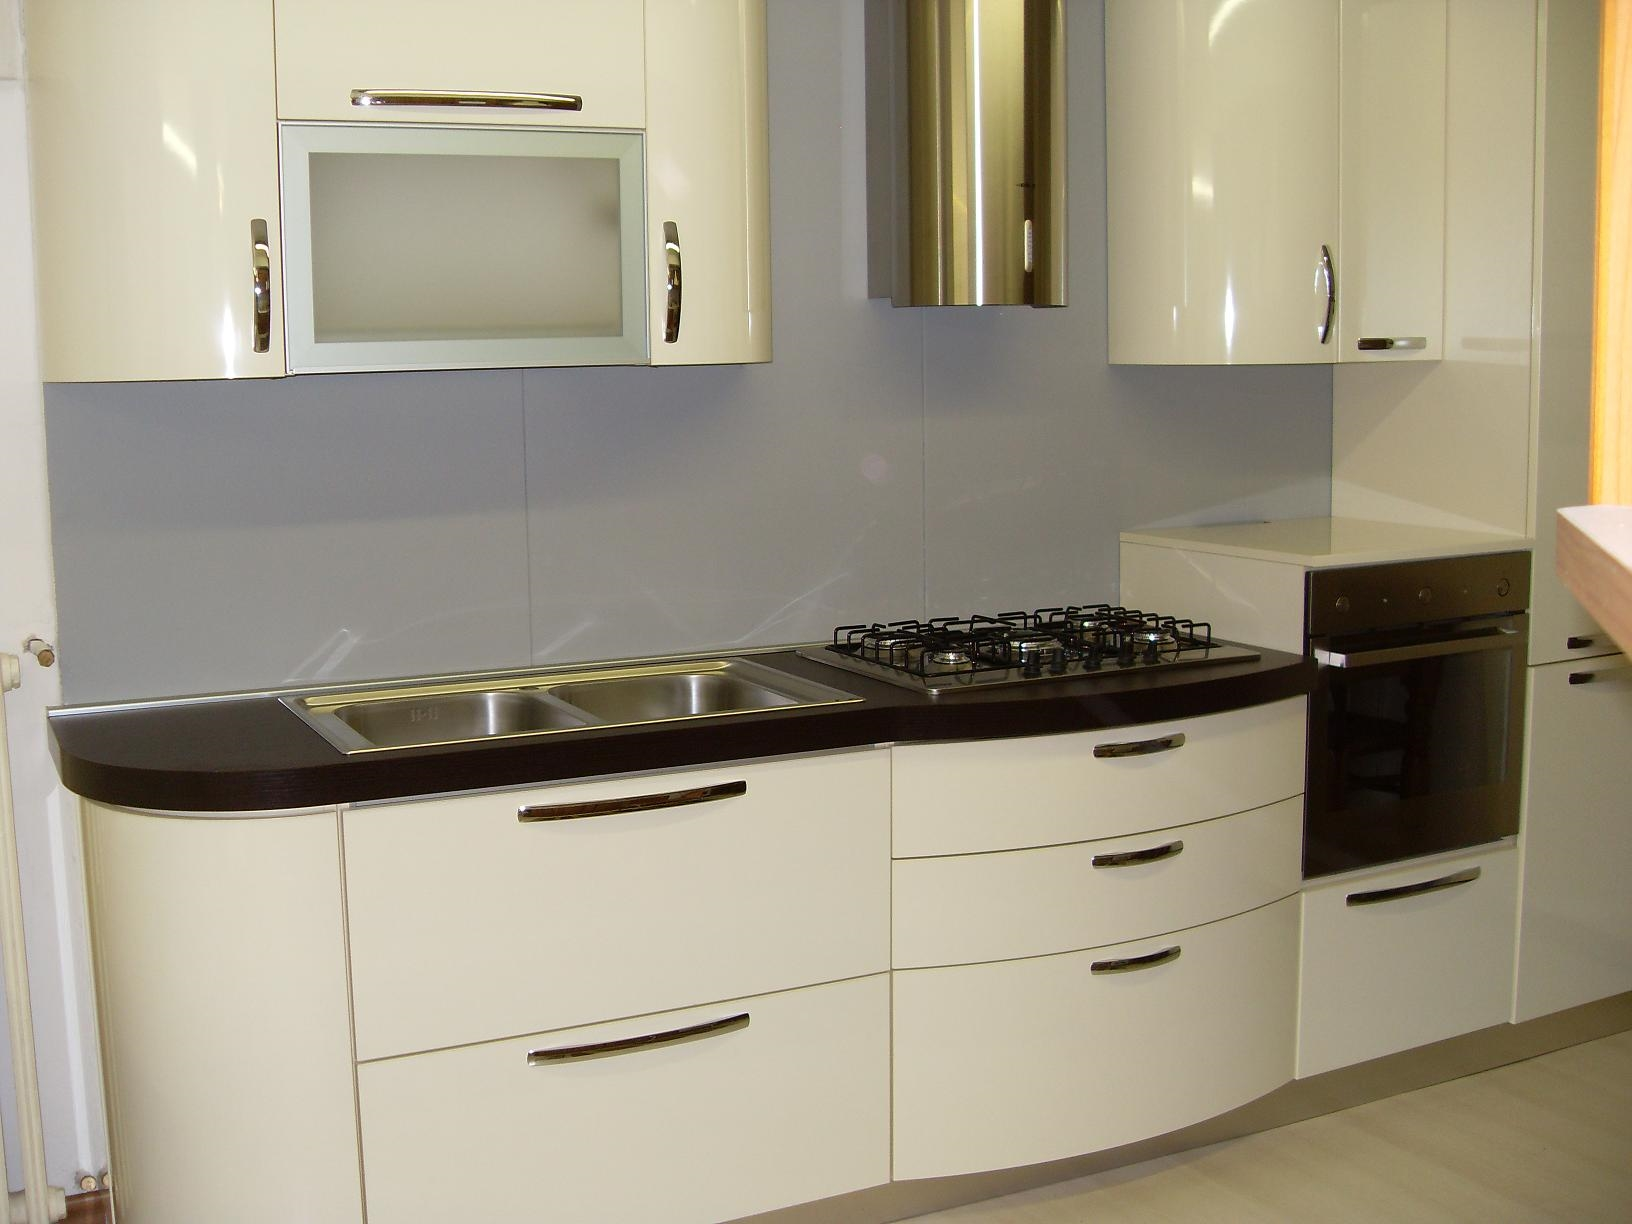 Cucine A Buon Prezzo. Stunning Prezzi Di Cucine Moderne Cucine ...